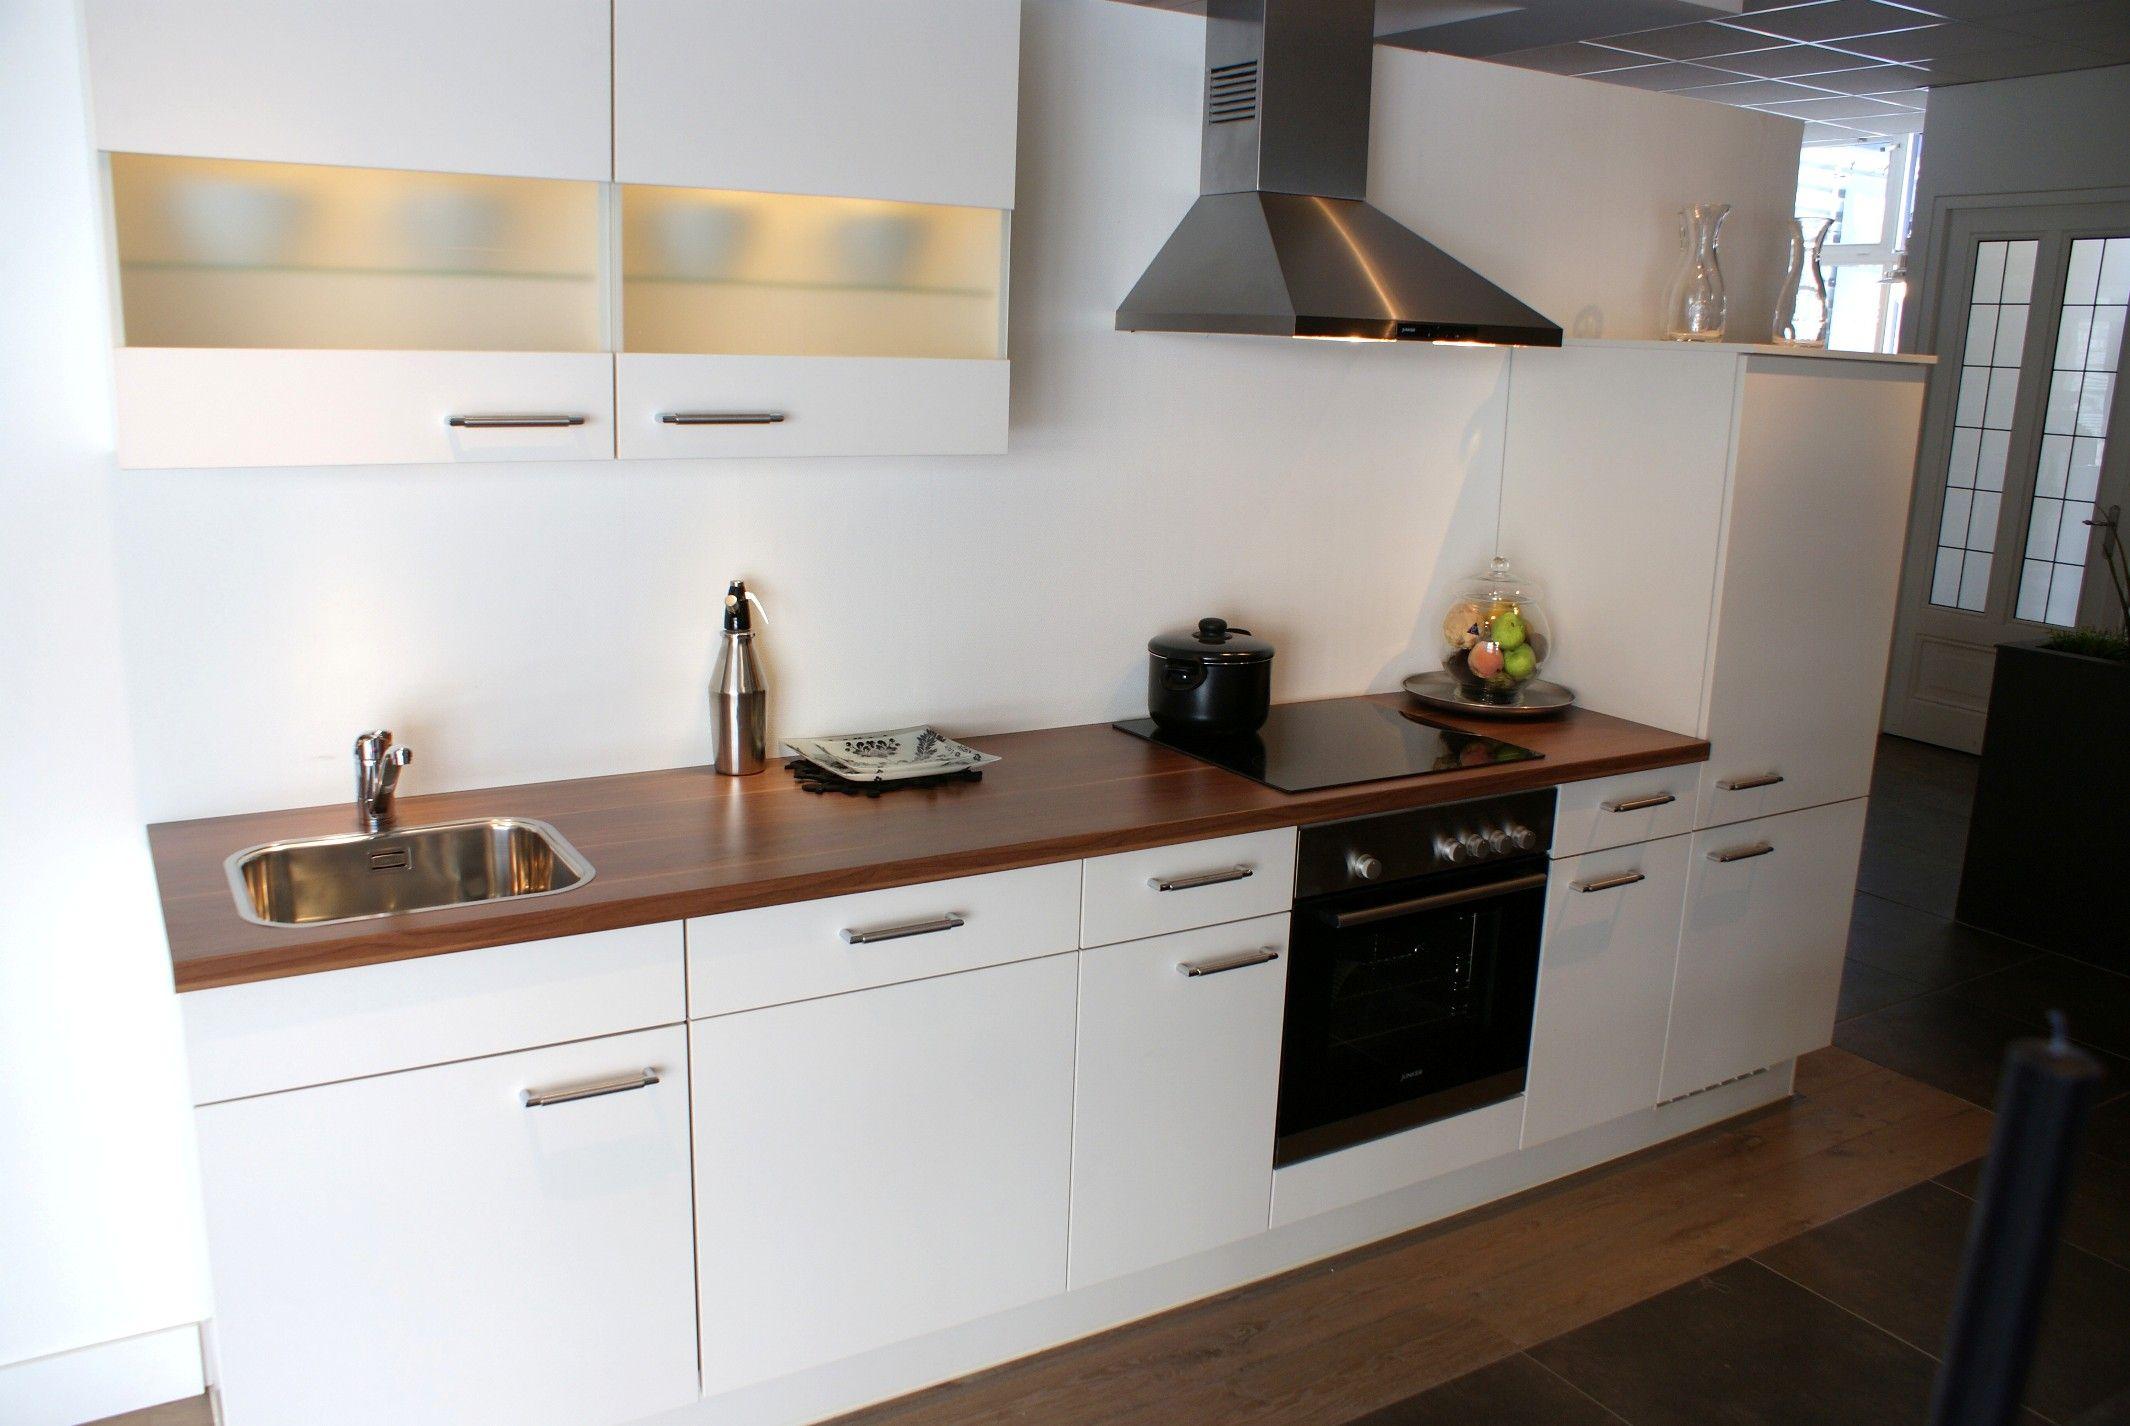 Keuken Kleur Magnolia : nl Het grootste keukenaanbod van Nederland Vivari magnolia [50085